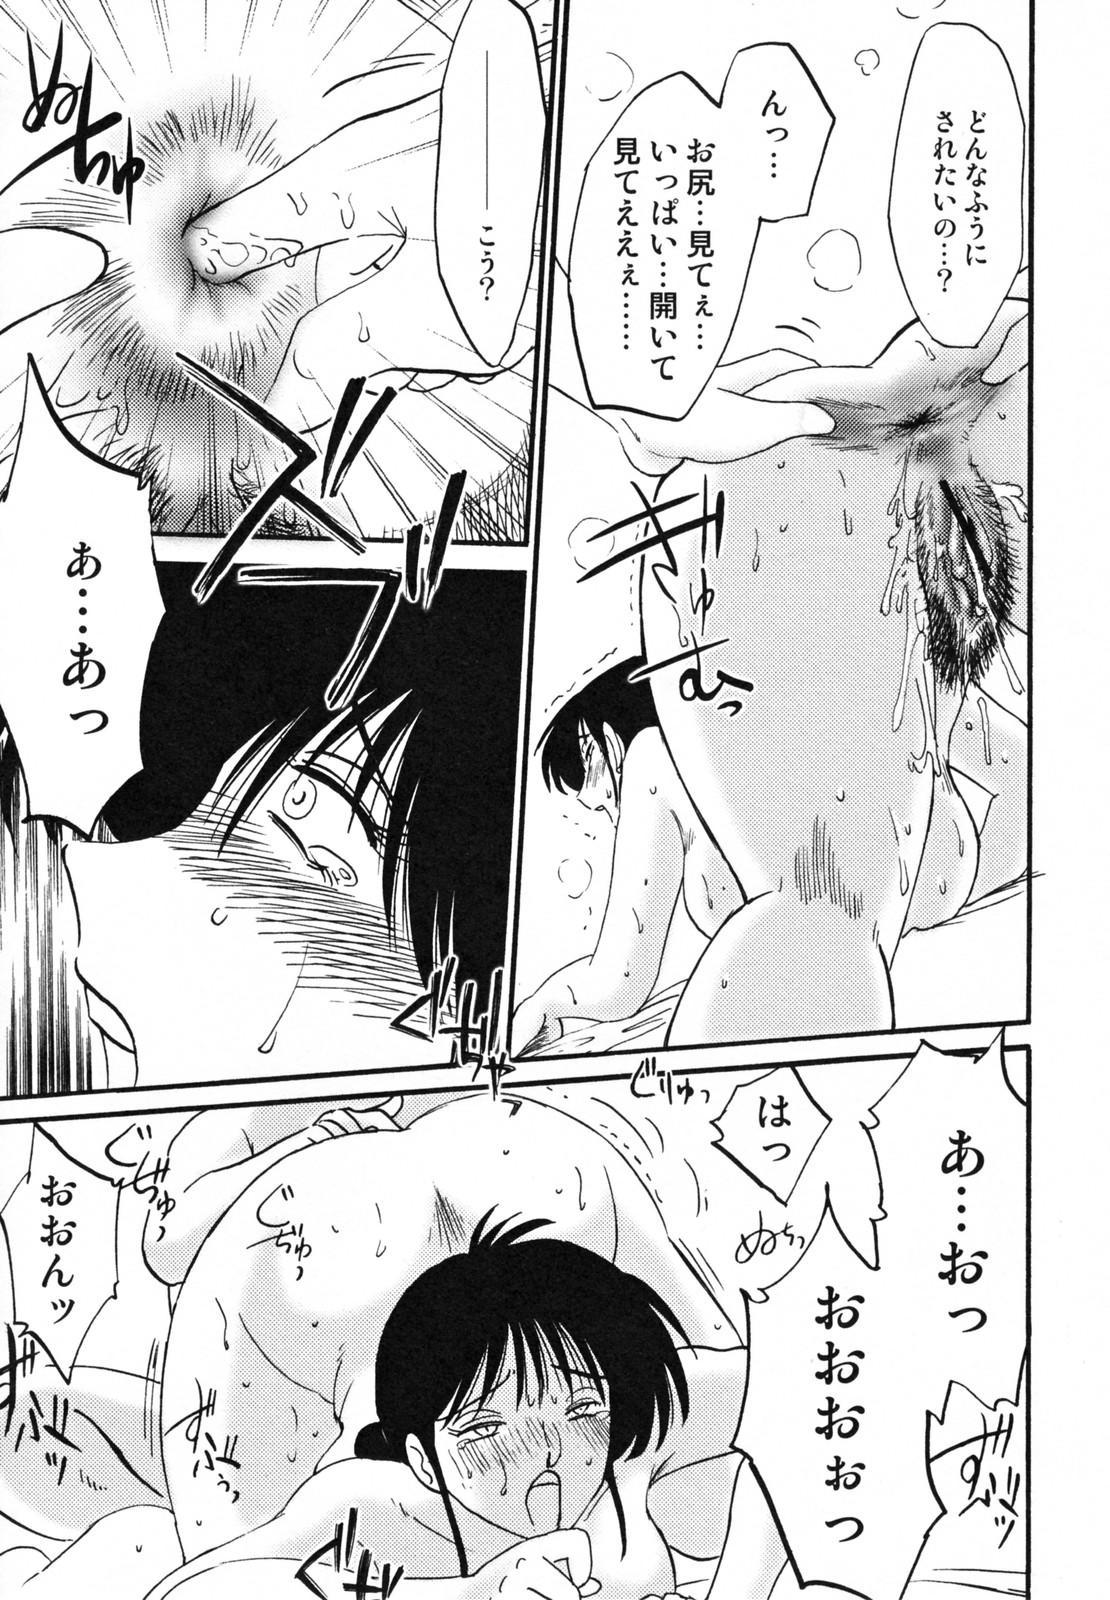 Hisae Haitoku Nikki Kanzenban Jou 144